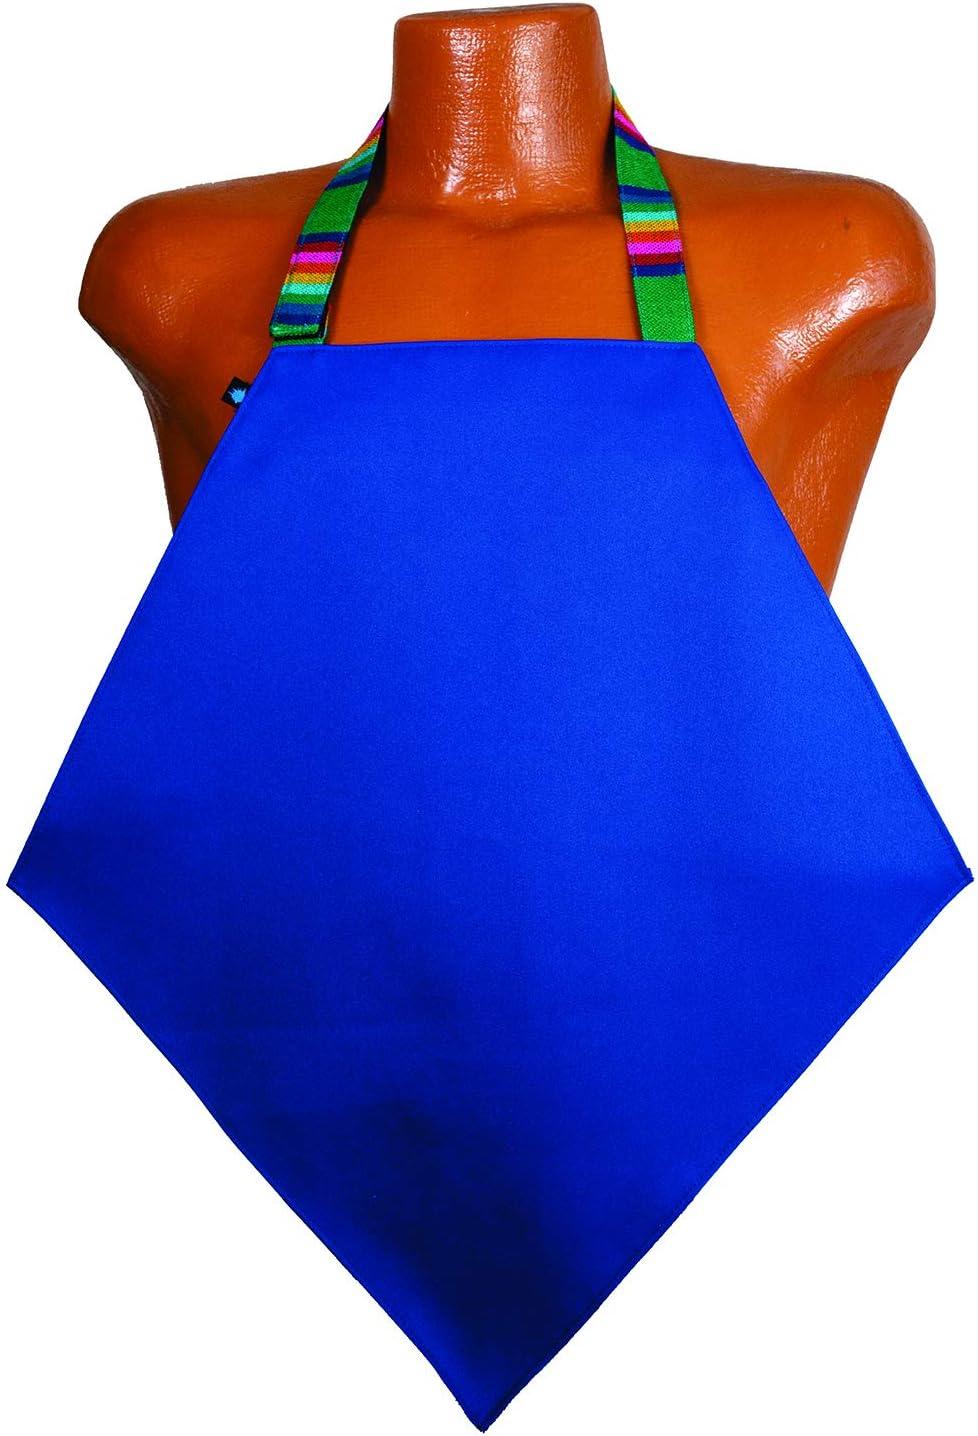 Food Firewall Adult Dining Bib/Mini-Apron-Top Clothing Protectors - Royal Blue Basico: Health & Personal Care